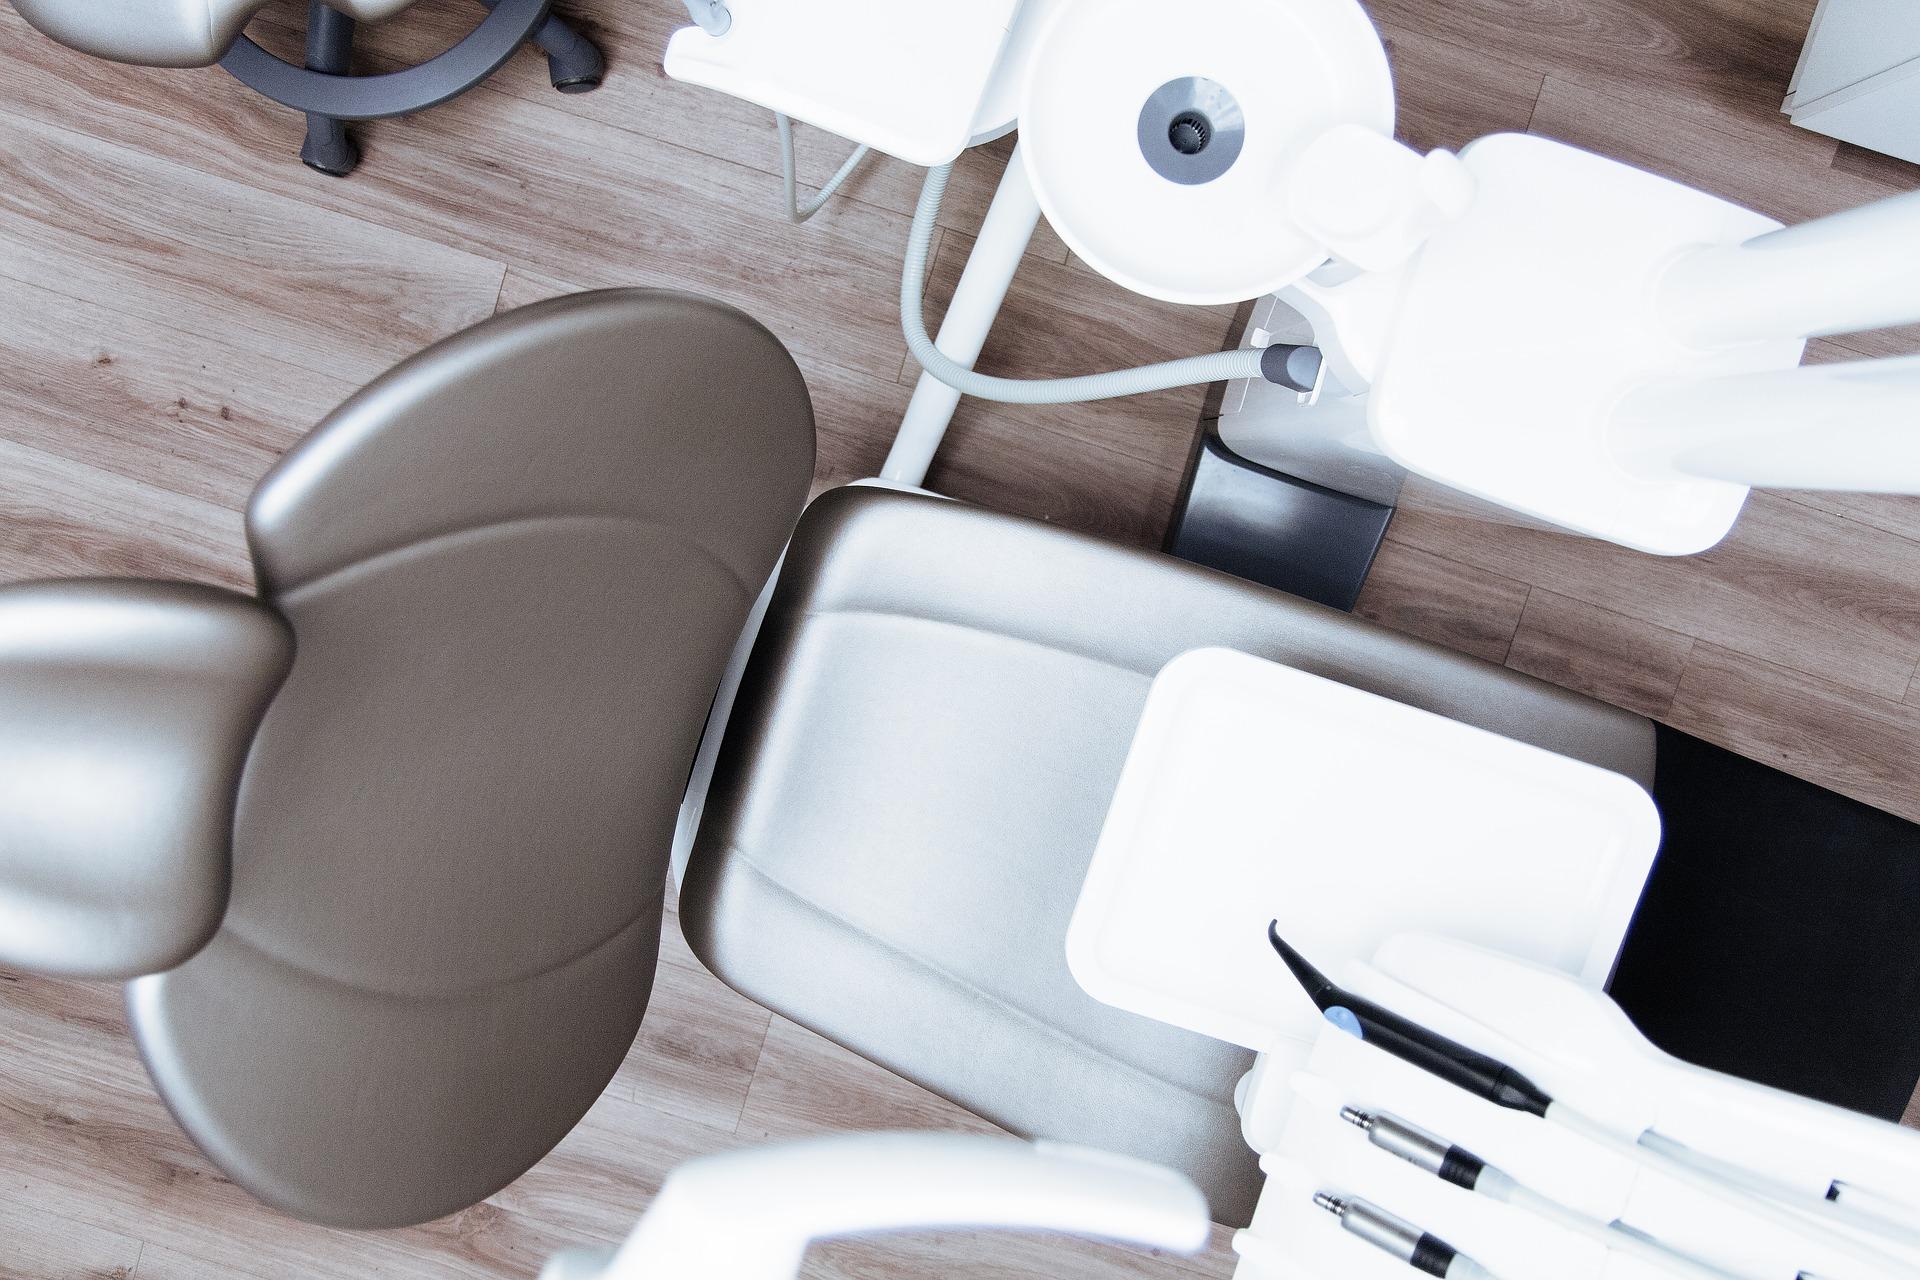 colorado springs dental practice for sale dentist chair